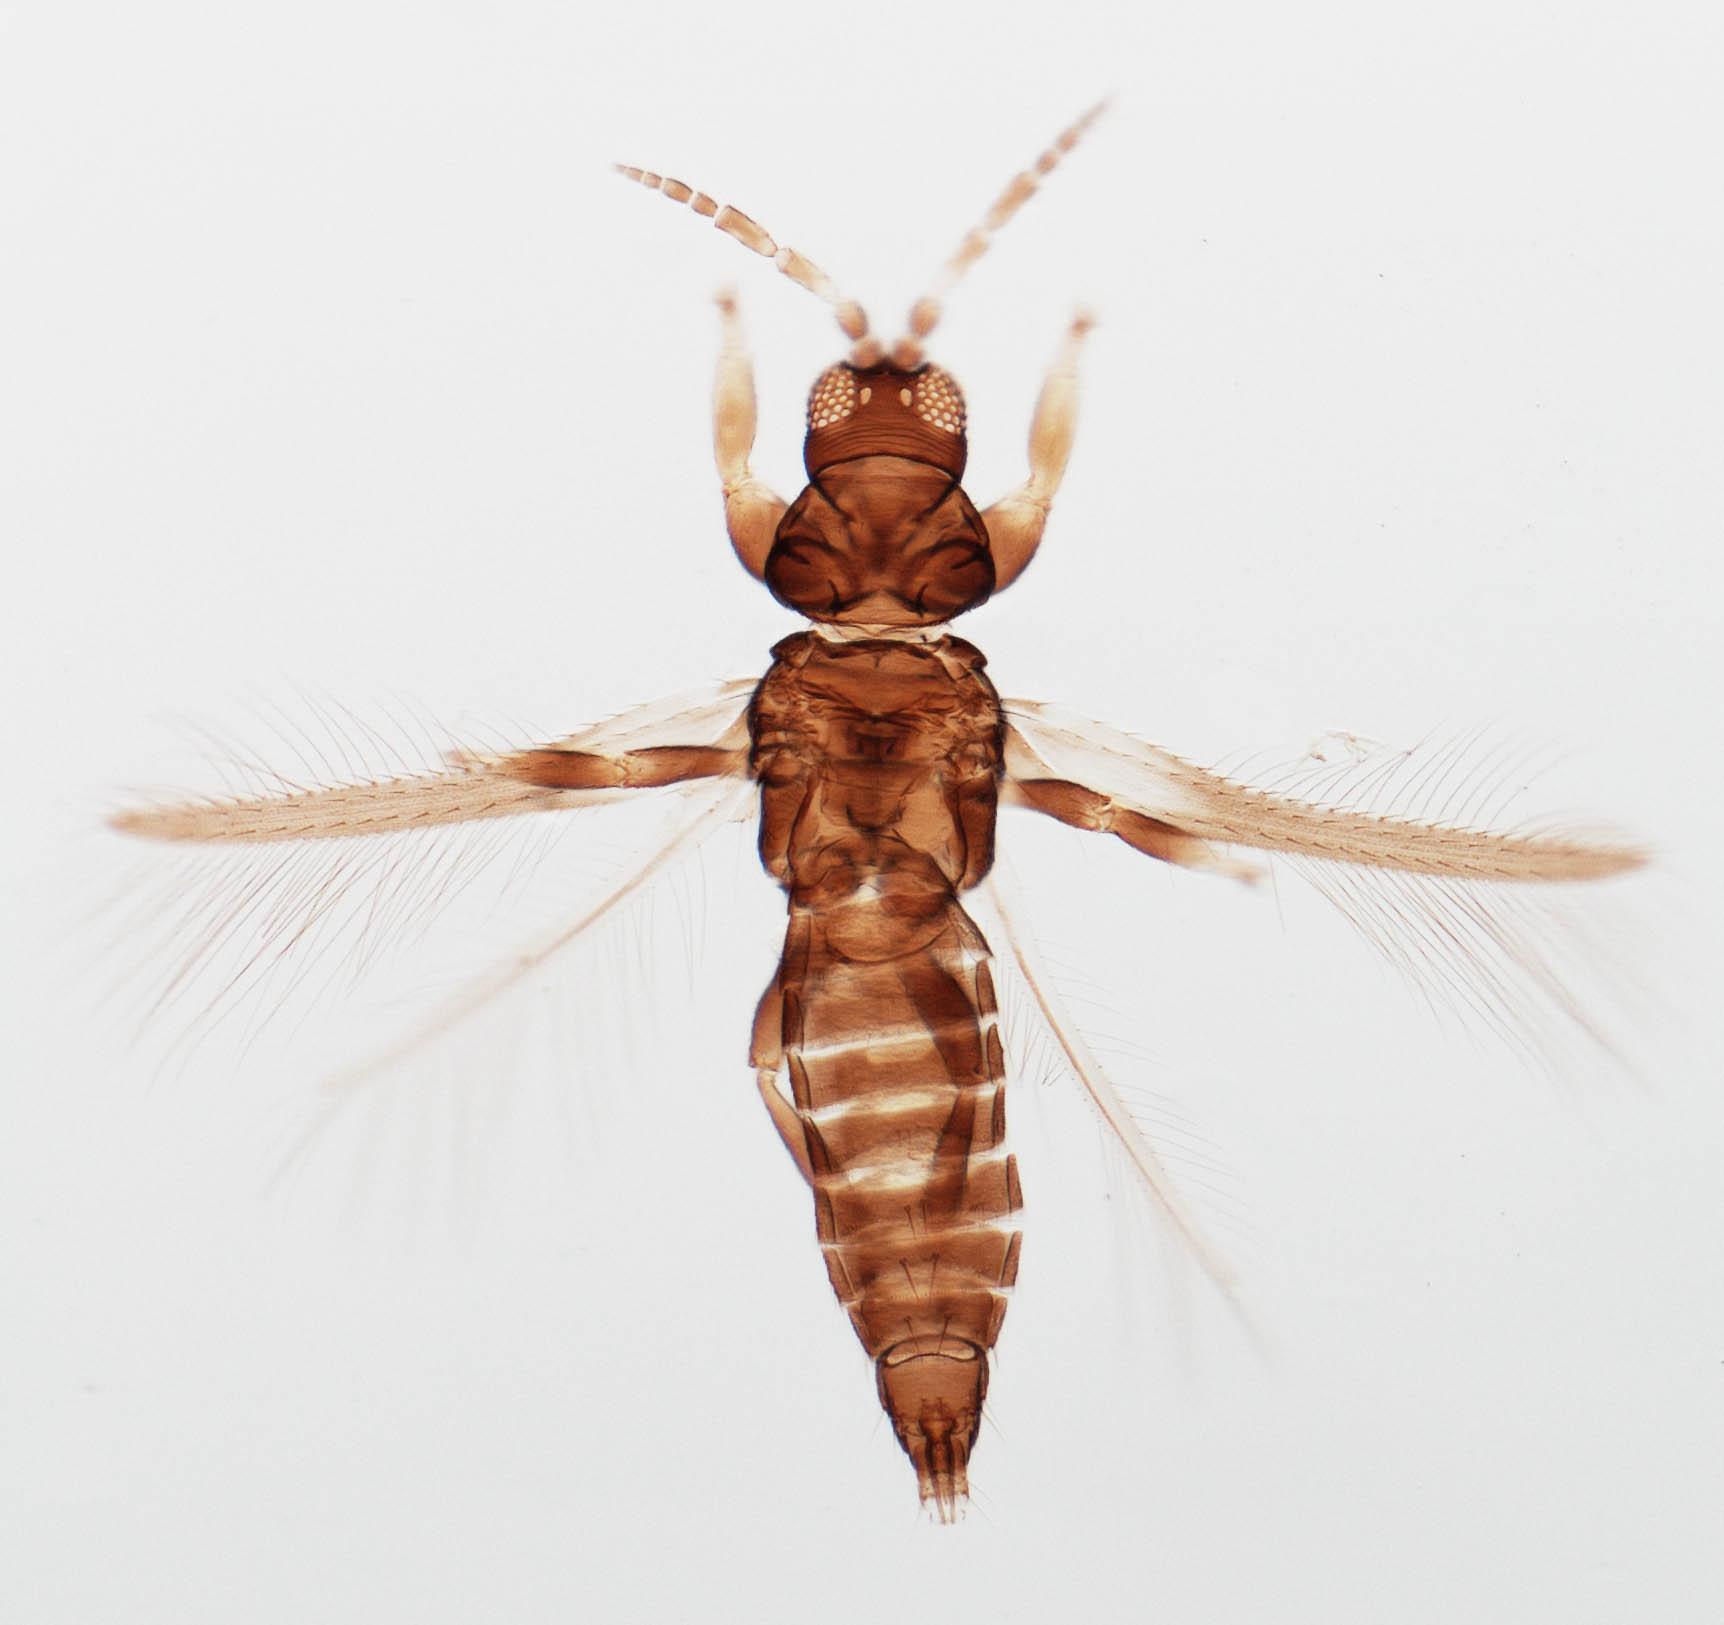 Lenkothrips guaraniticus